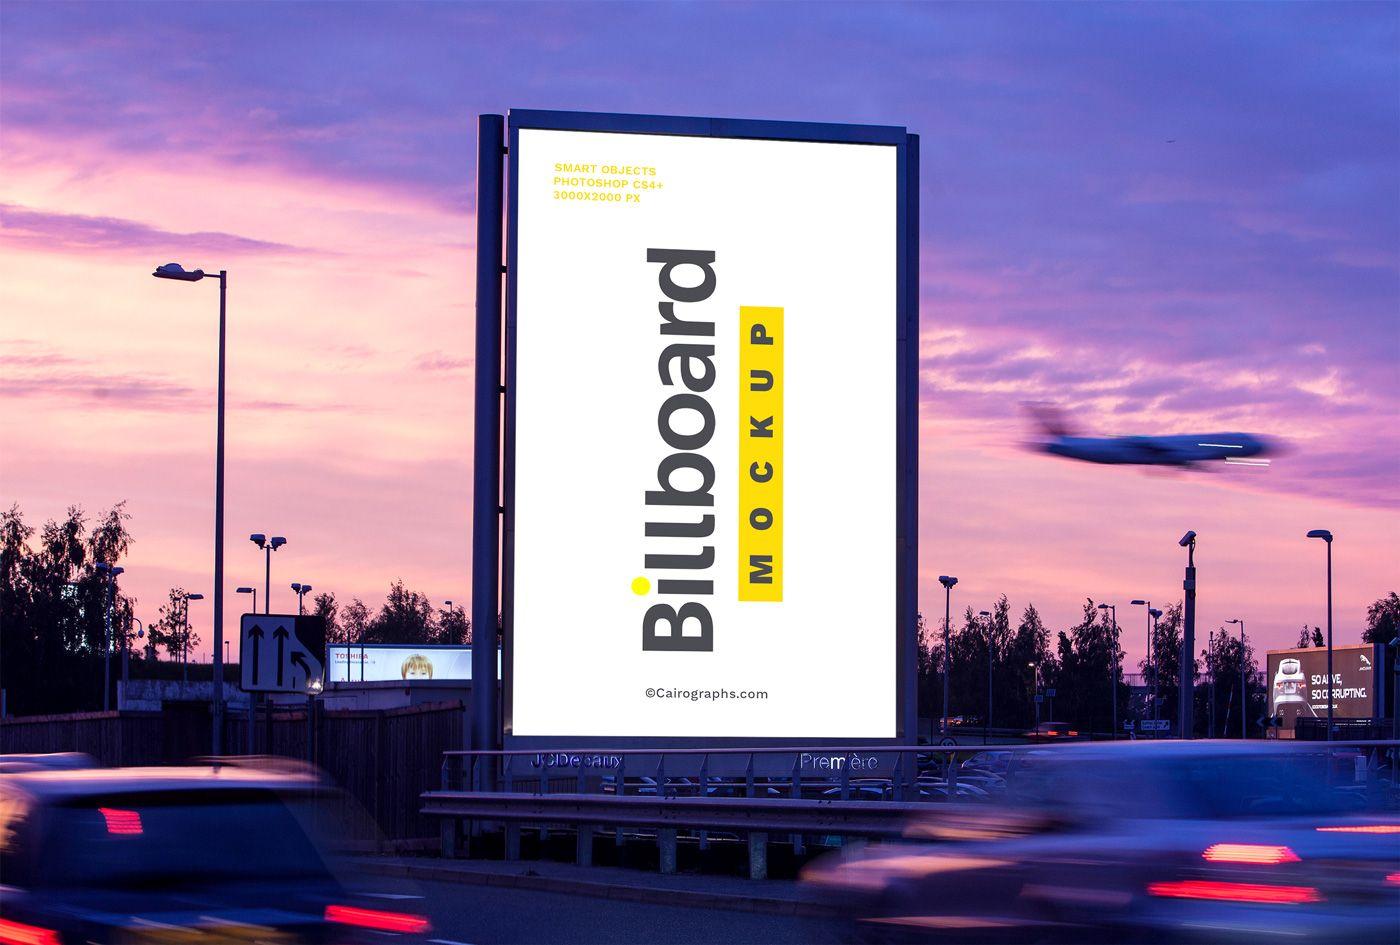 Pin By Deepak Yadav On Kim Beauty Vu In 2021 Billboard Mockup Billboard Mockup Templates